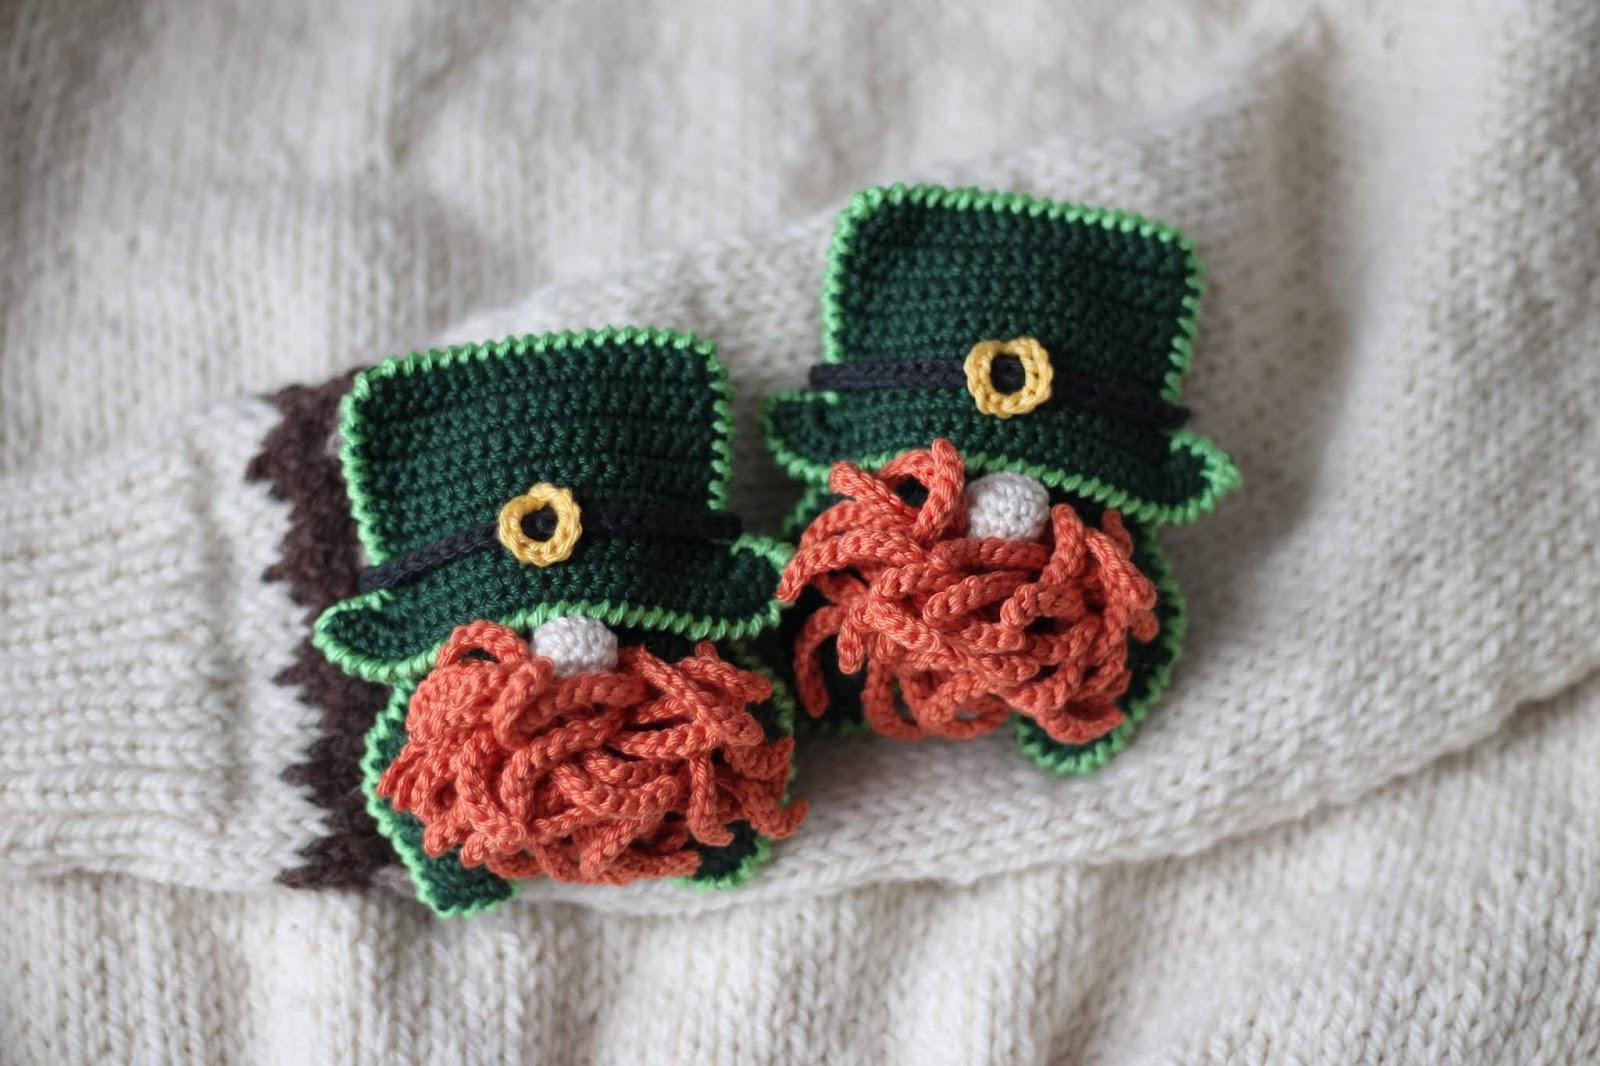 Amigurumi Cow - Free Crochet Pattern - Stella's Yarn Universe | 1066x1600